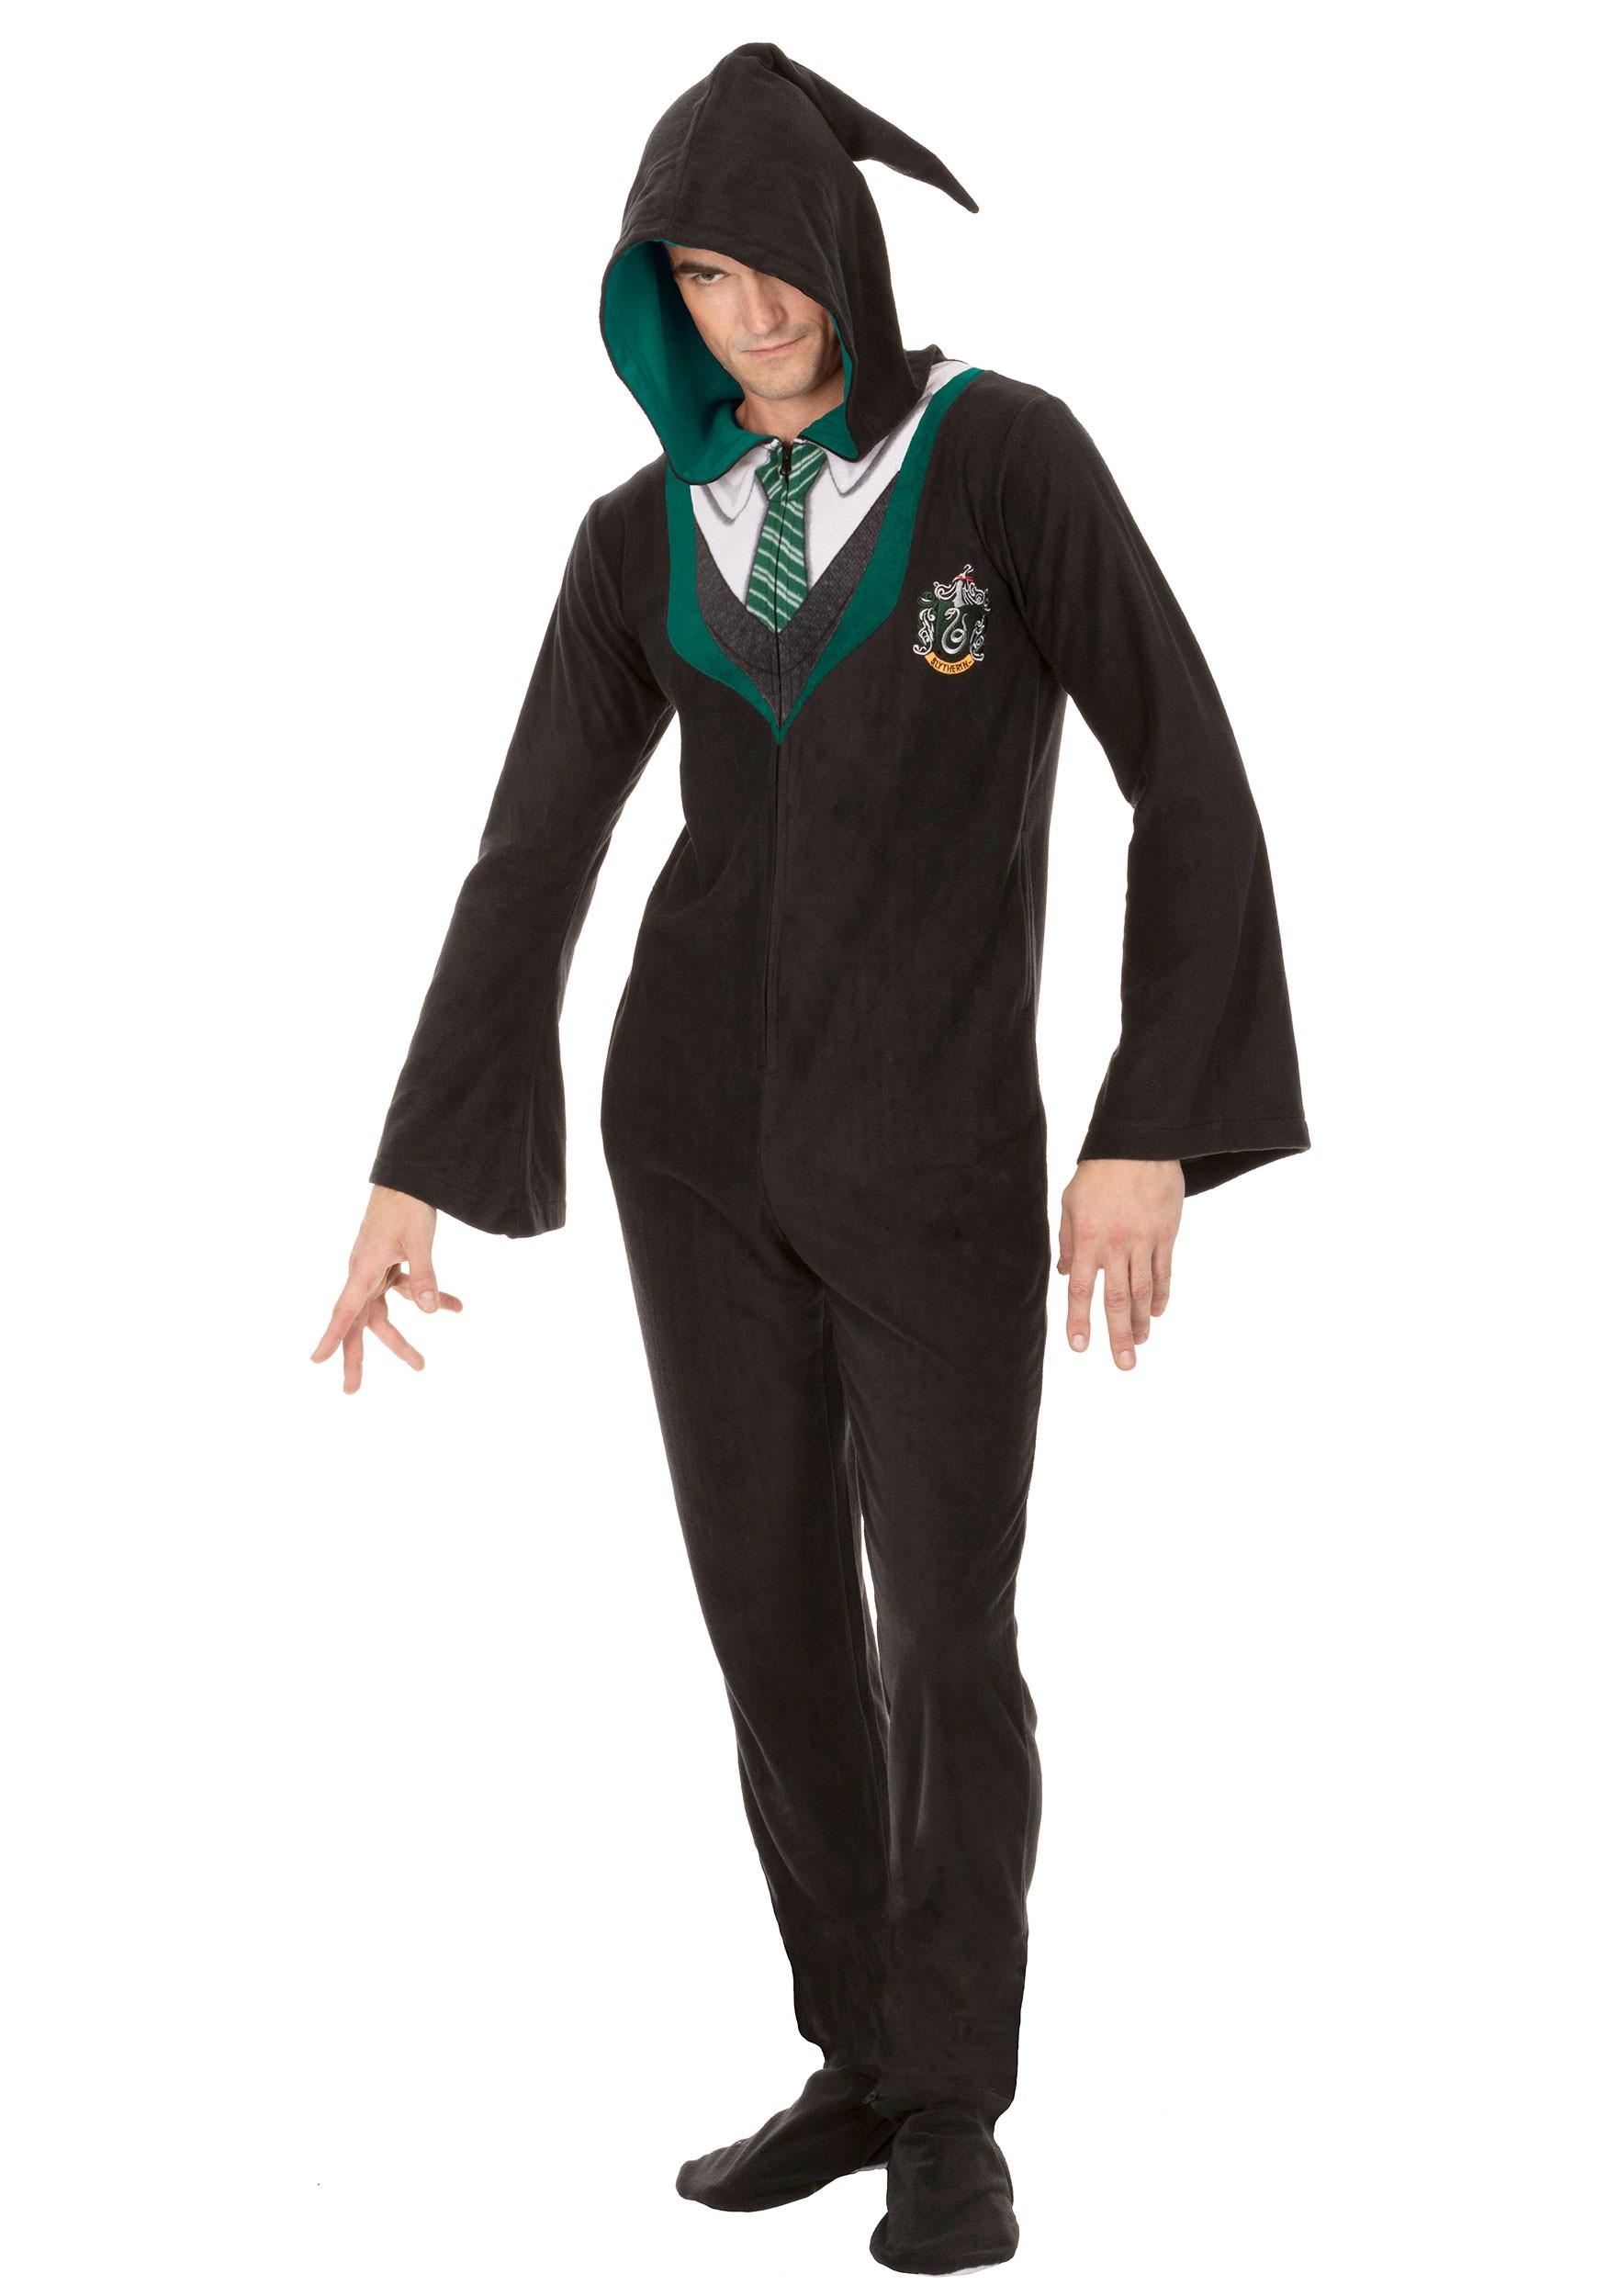 Harry Potter Slytherin Adult's Union Suit